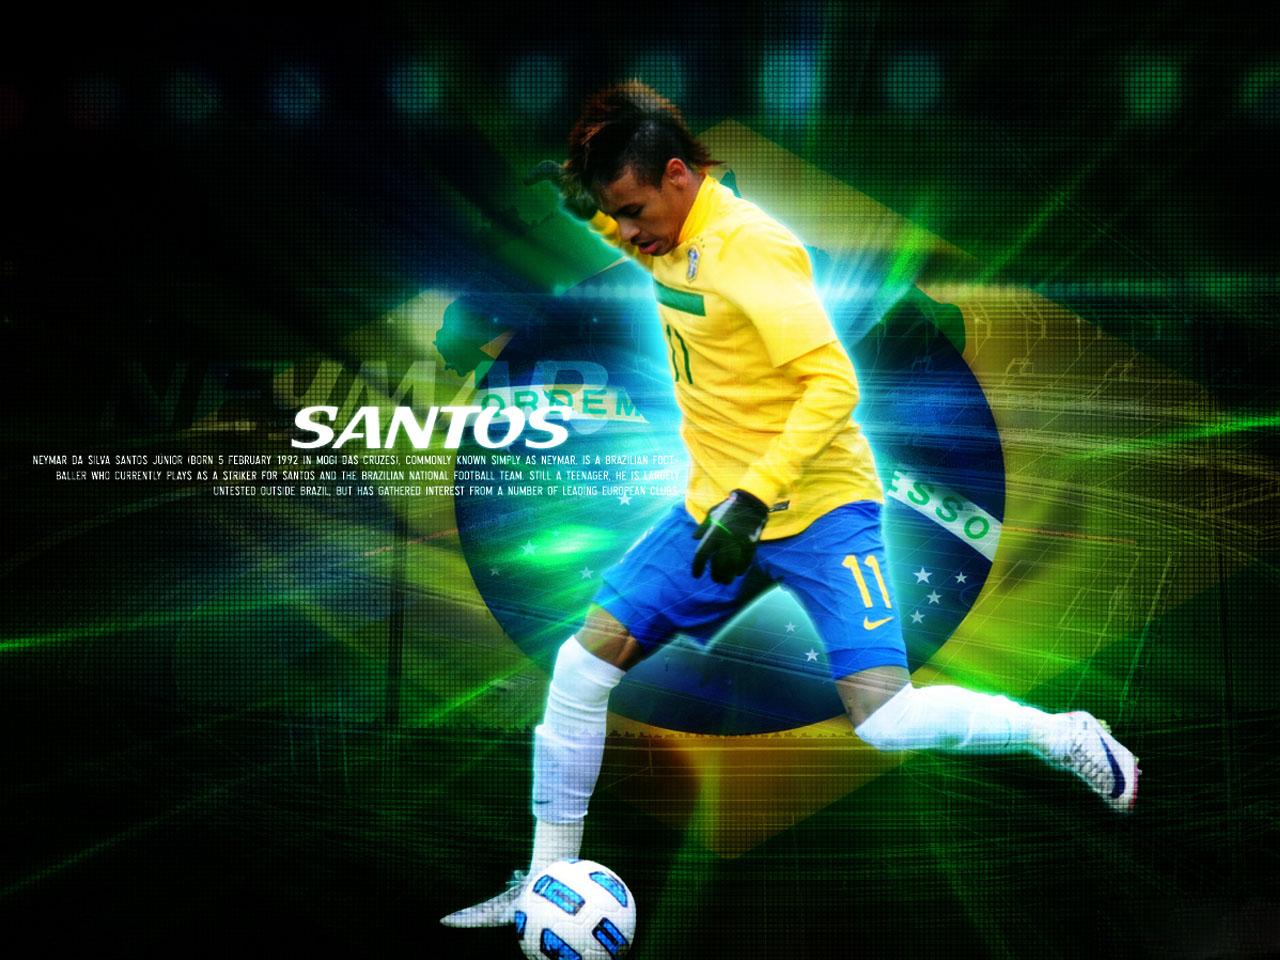 Best Sport Wallpapers: Neymar Wallpapers  Best Sport Wall...